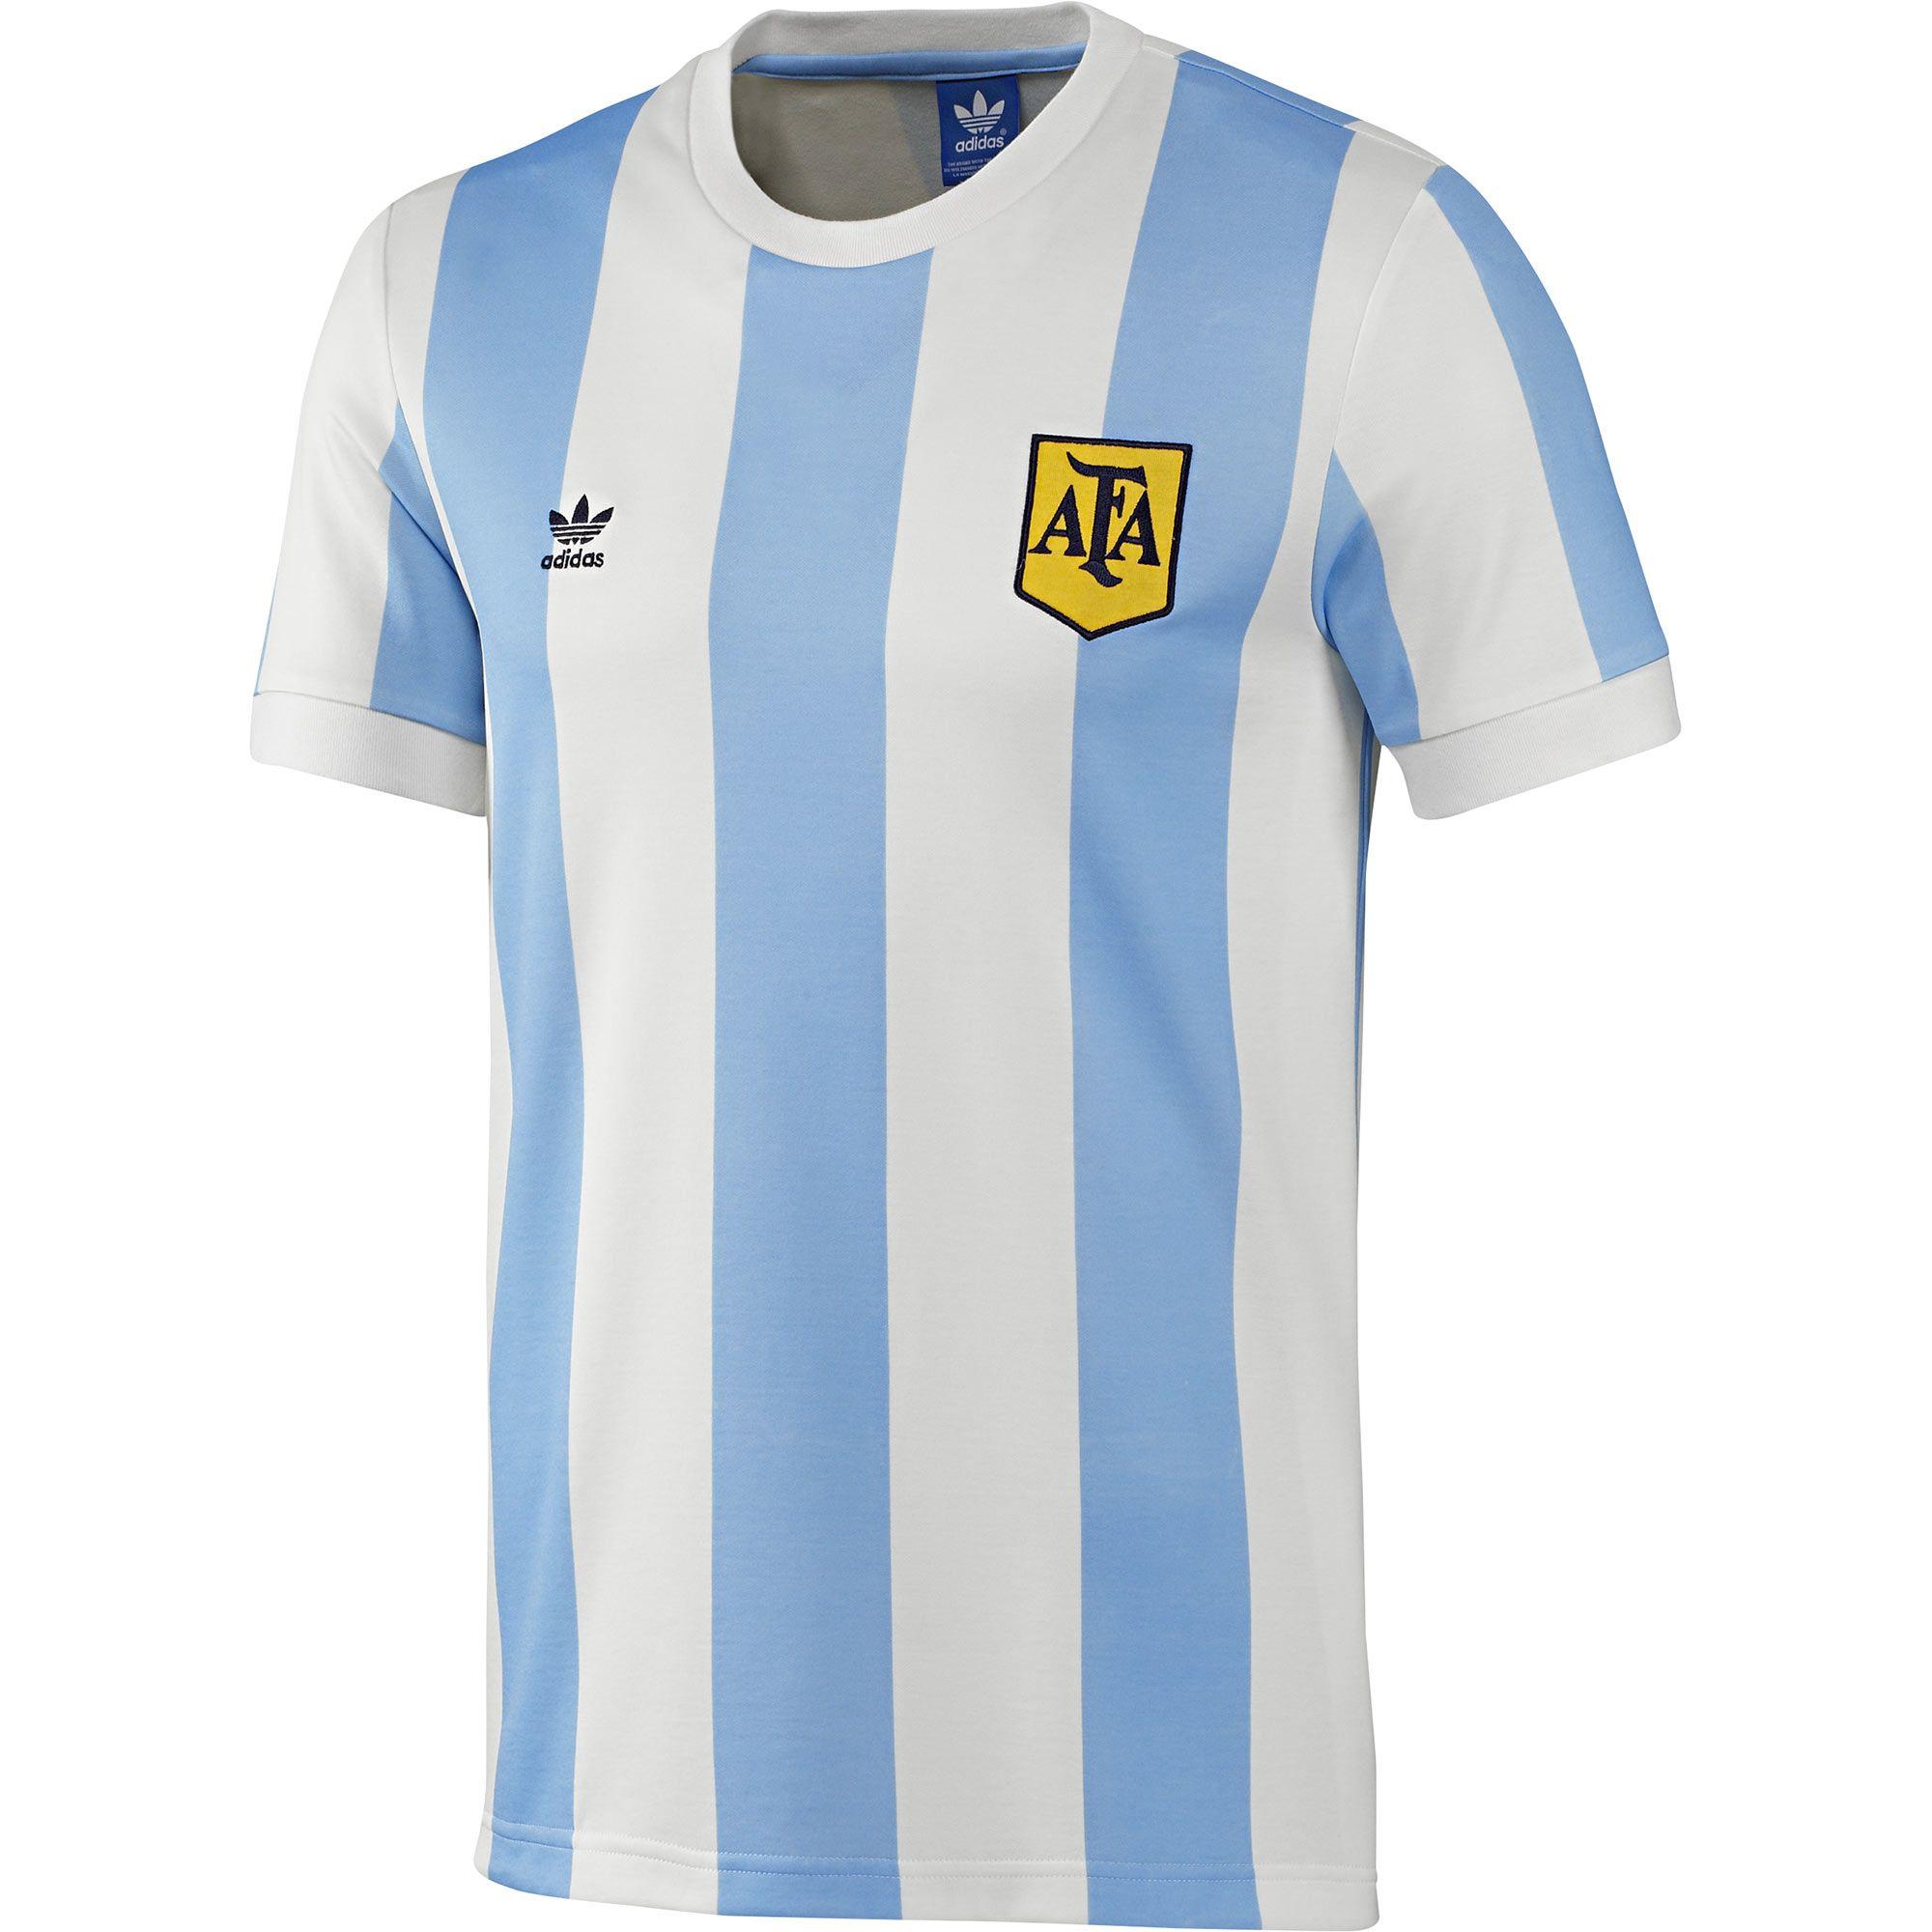 Camisa Retrô Argentina Adidas Adidas Brasil 150 Camisetas Retro Camisetas Deportivas Camisetas De Fútbol